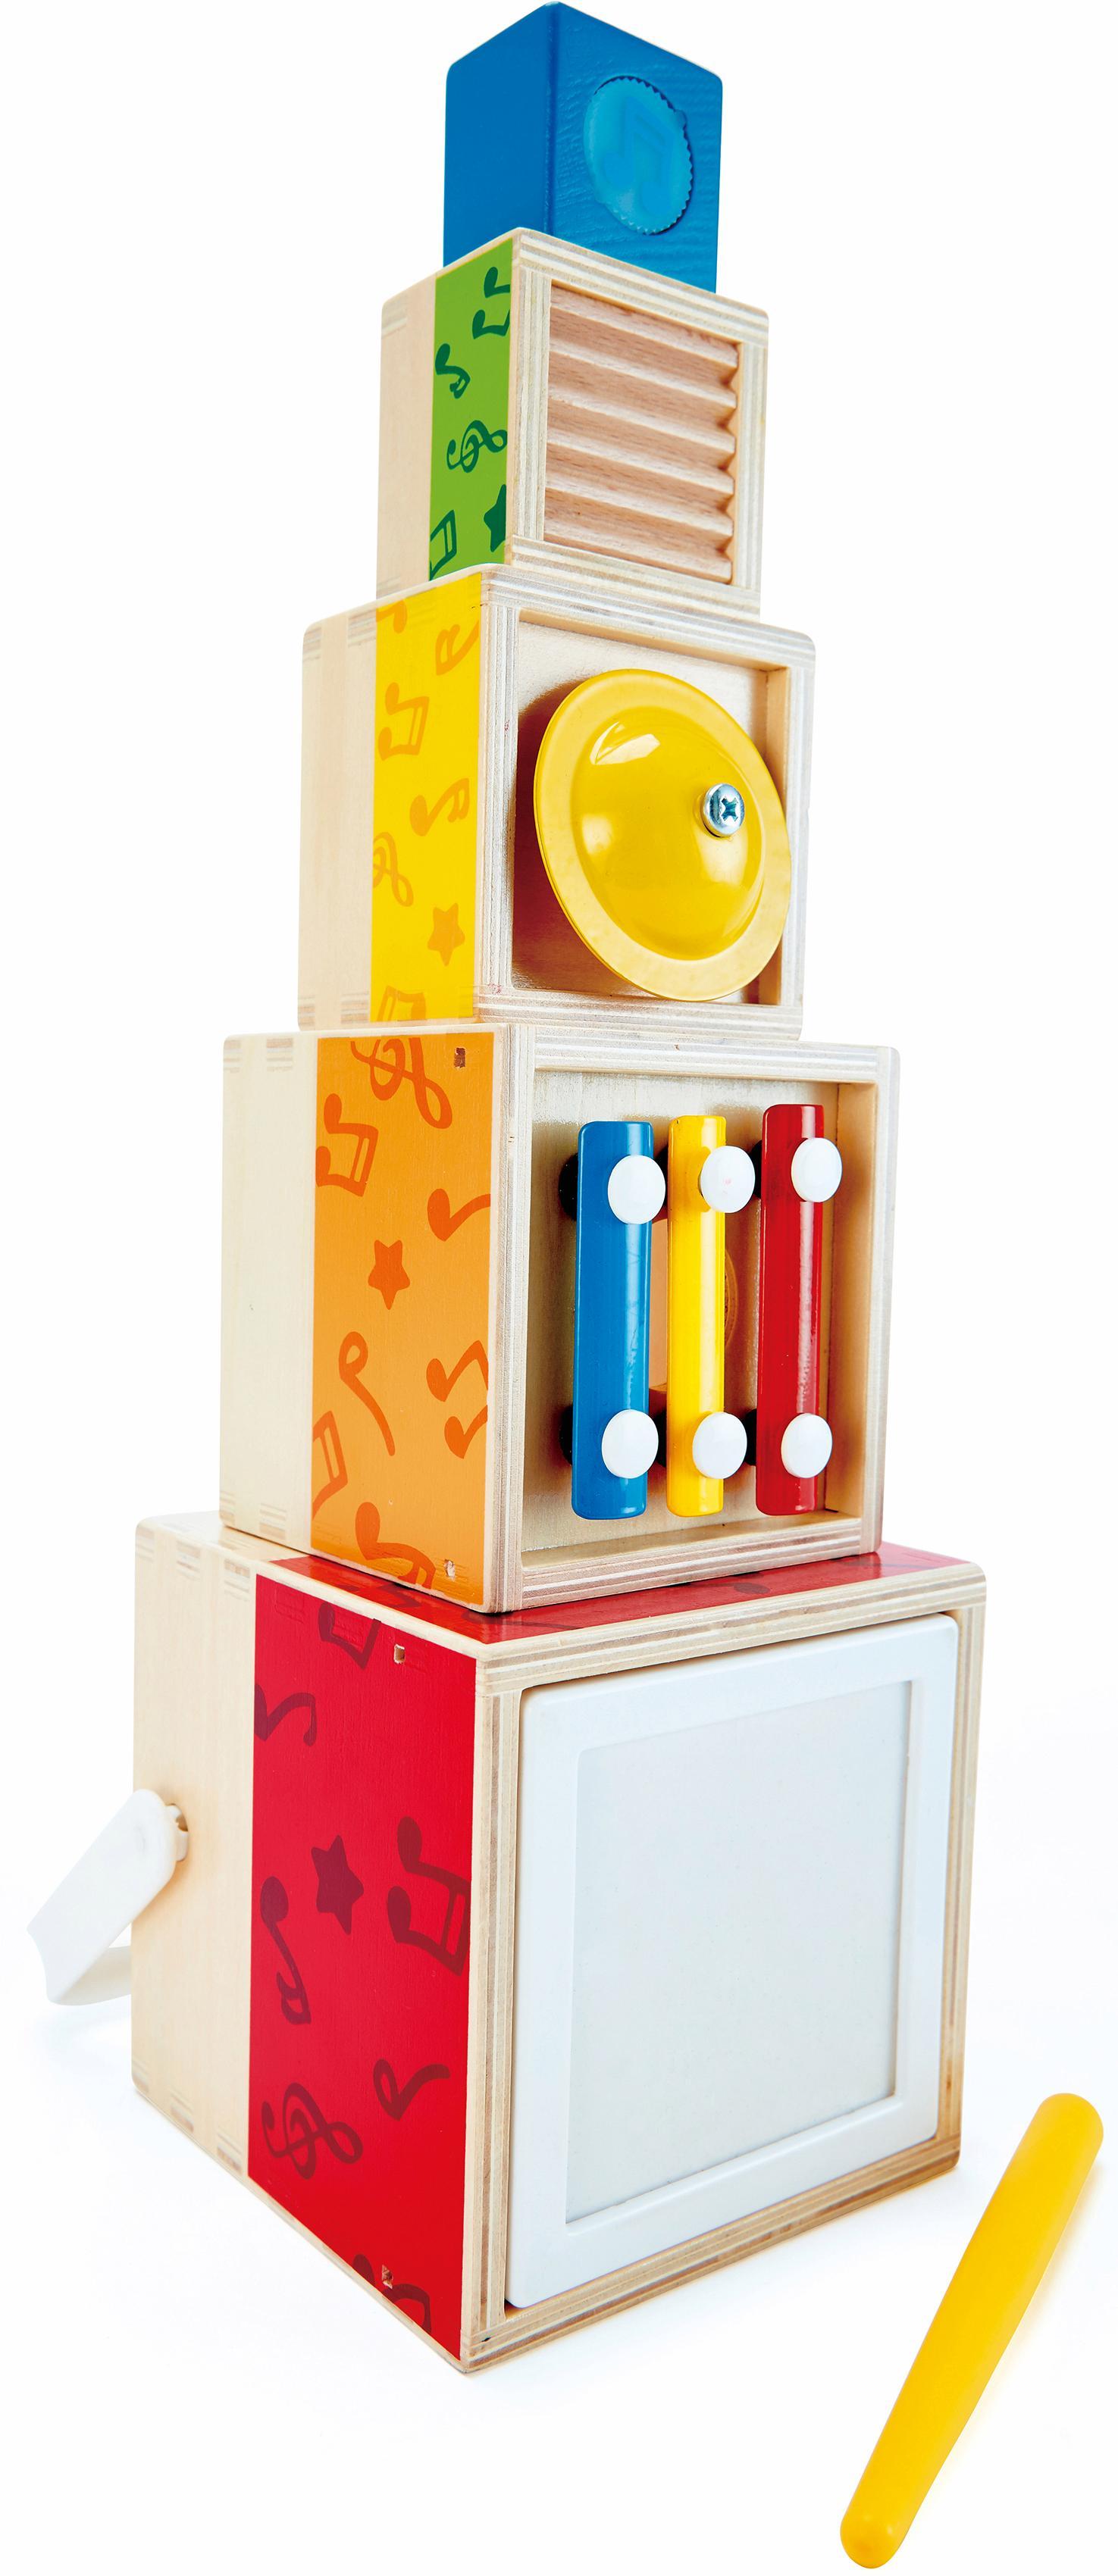 "Hape Spielzeug-Musikinstrument ""Musik-Stapelwürfel"" Kindermode/Spielzeug/Musikinstrumente/Musikspielzeug"